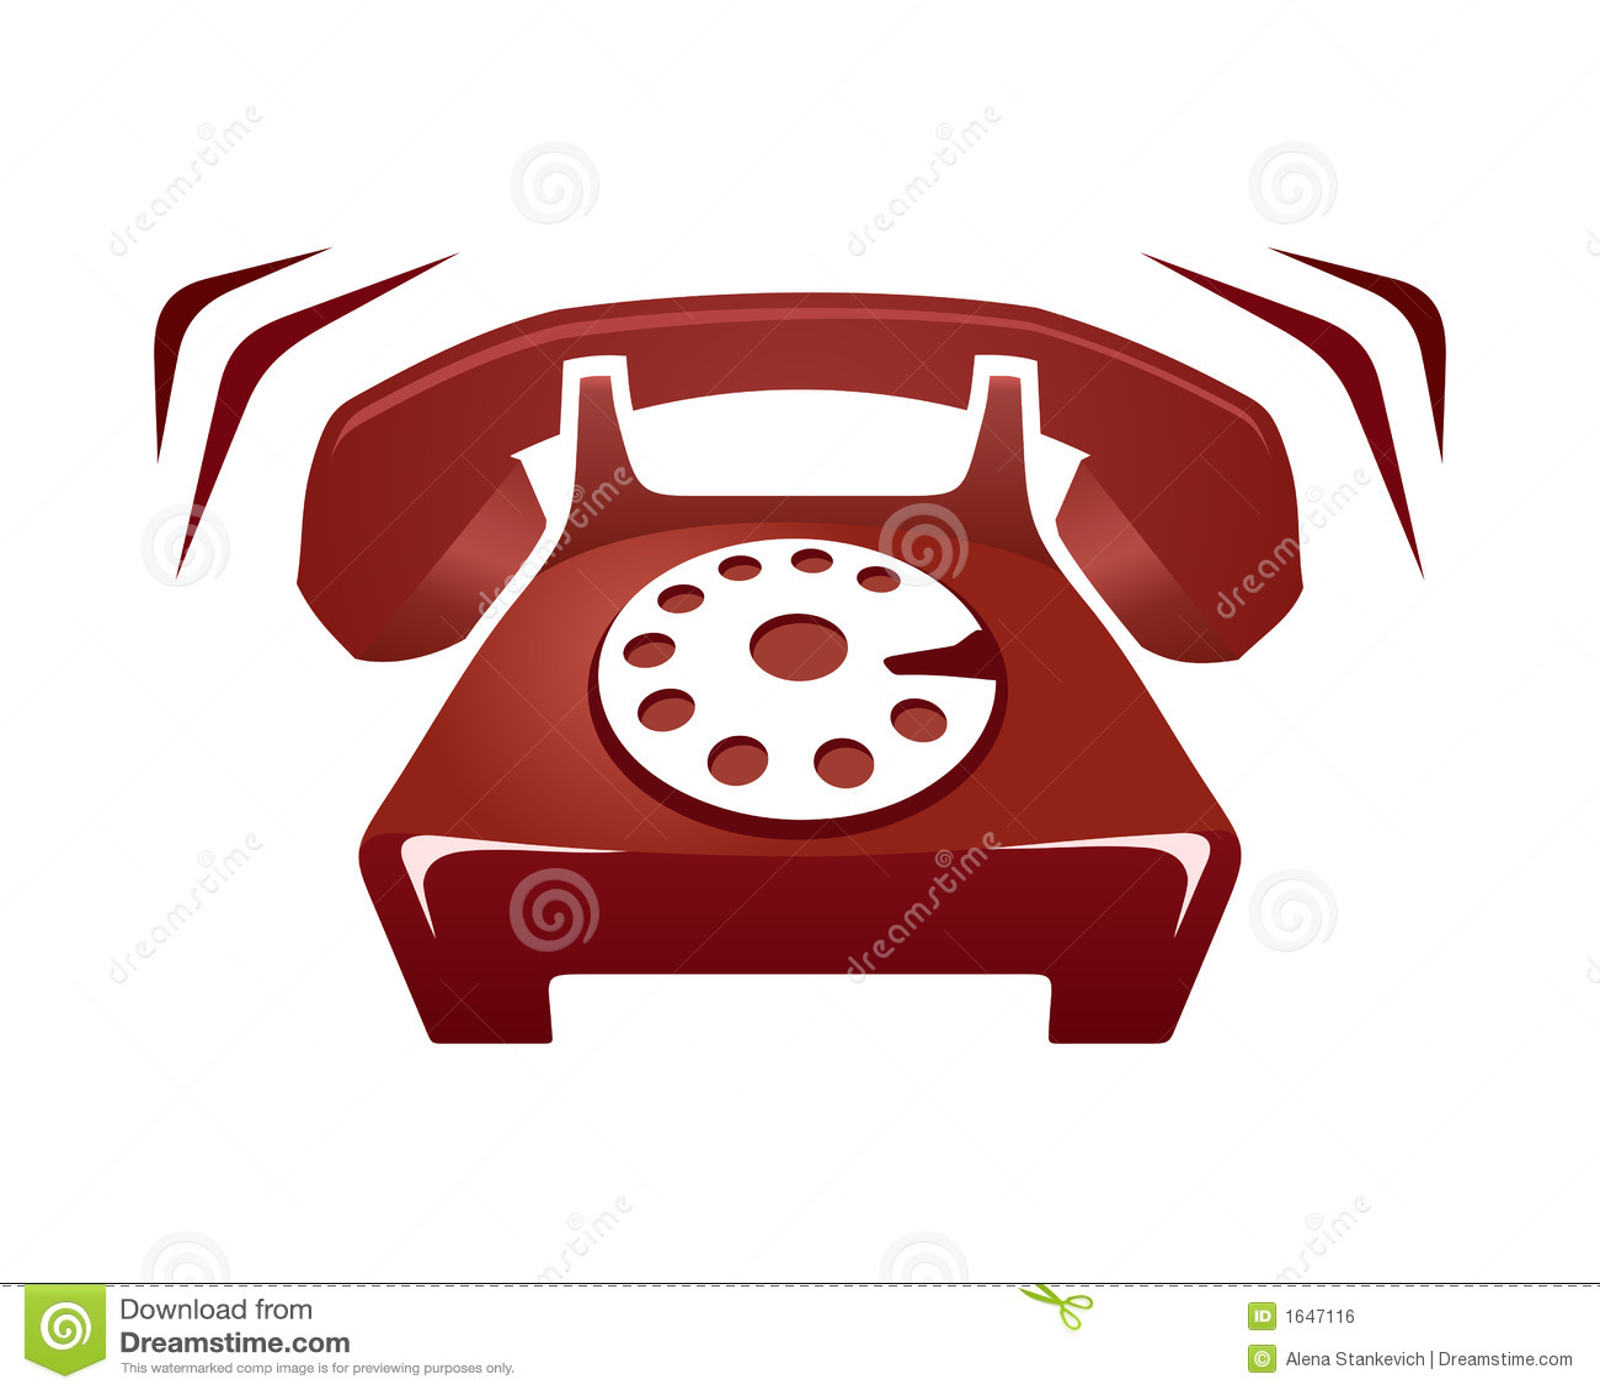 Schellentelefon